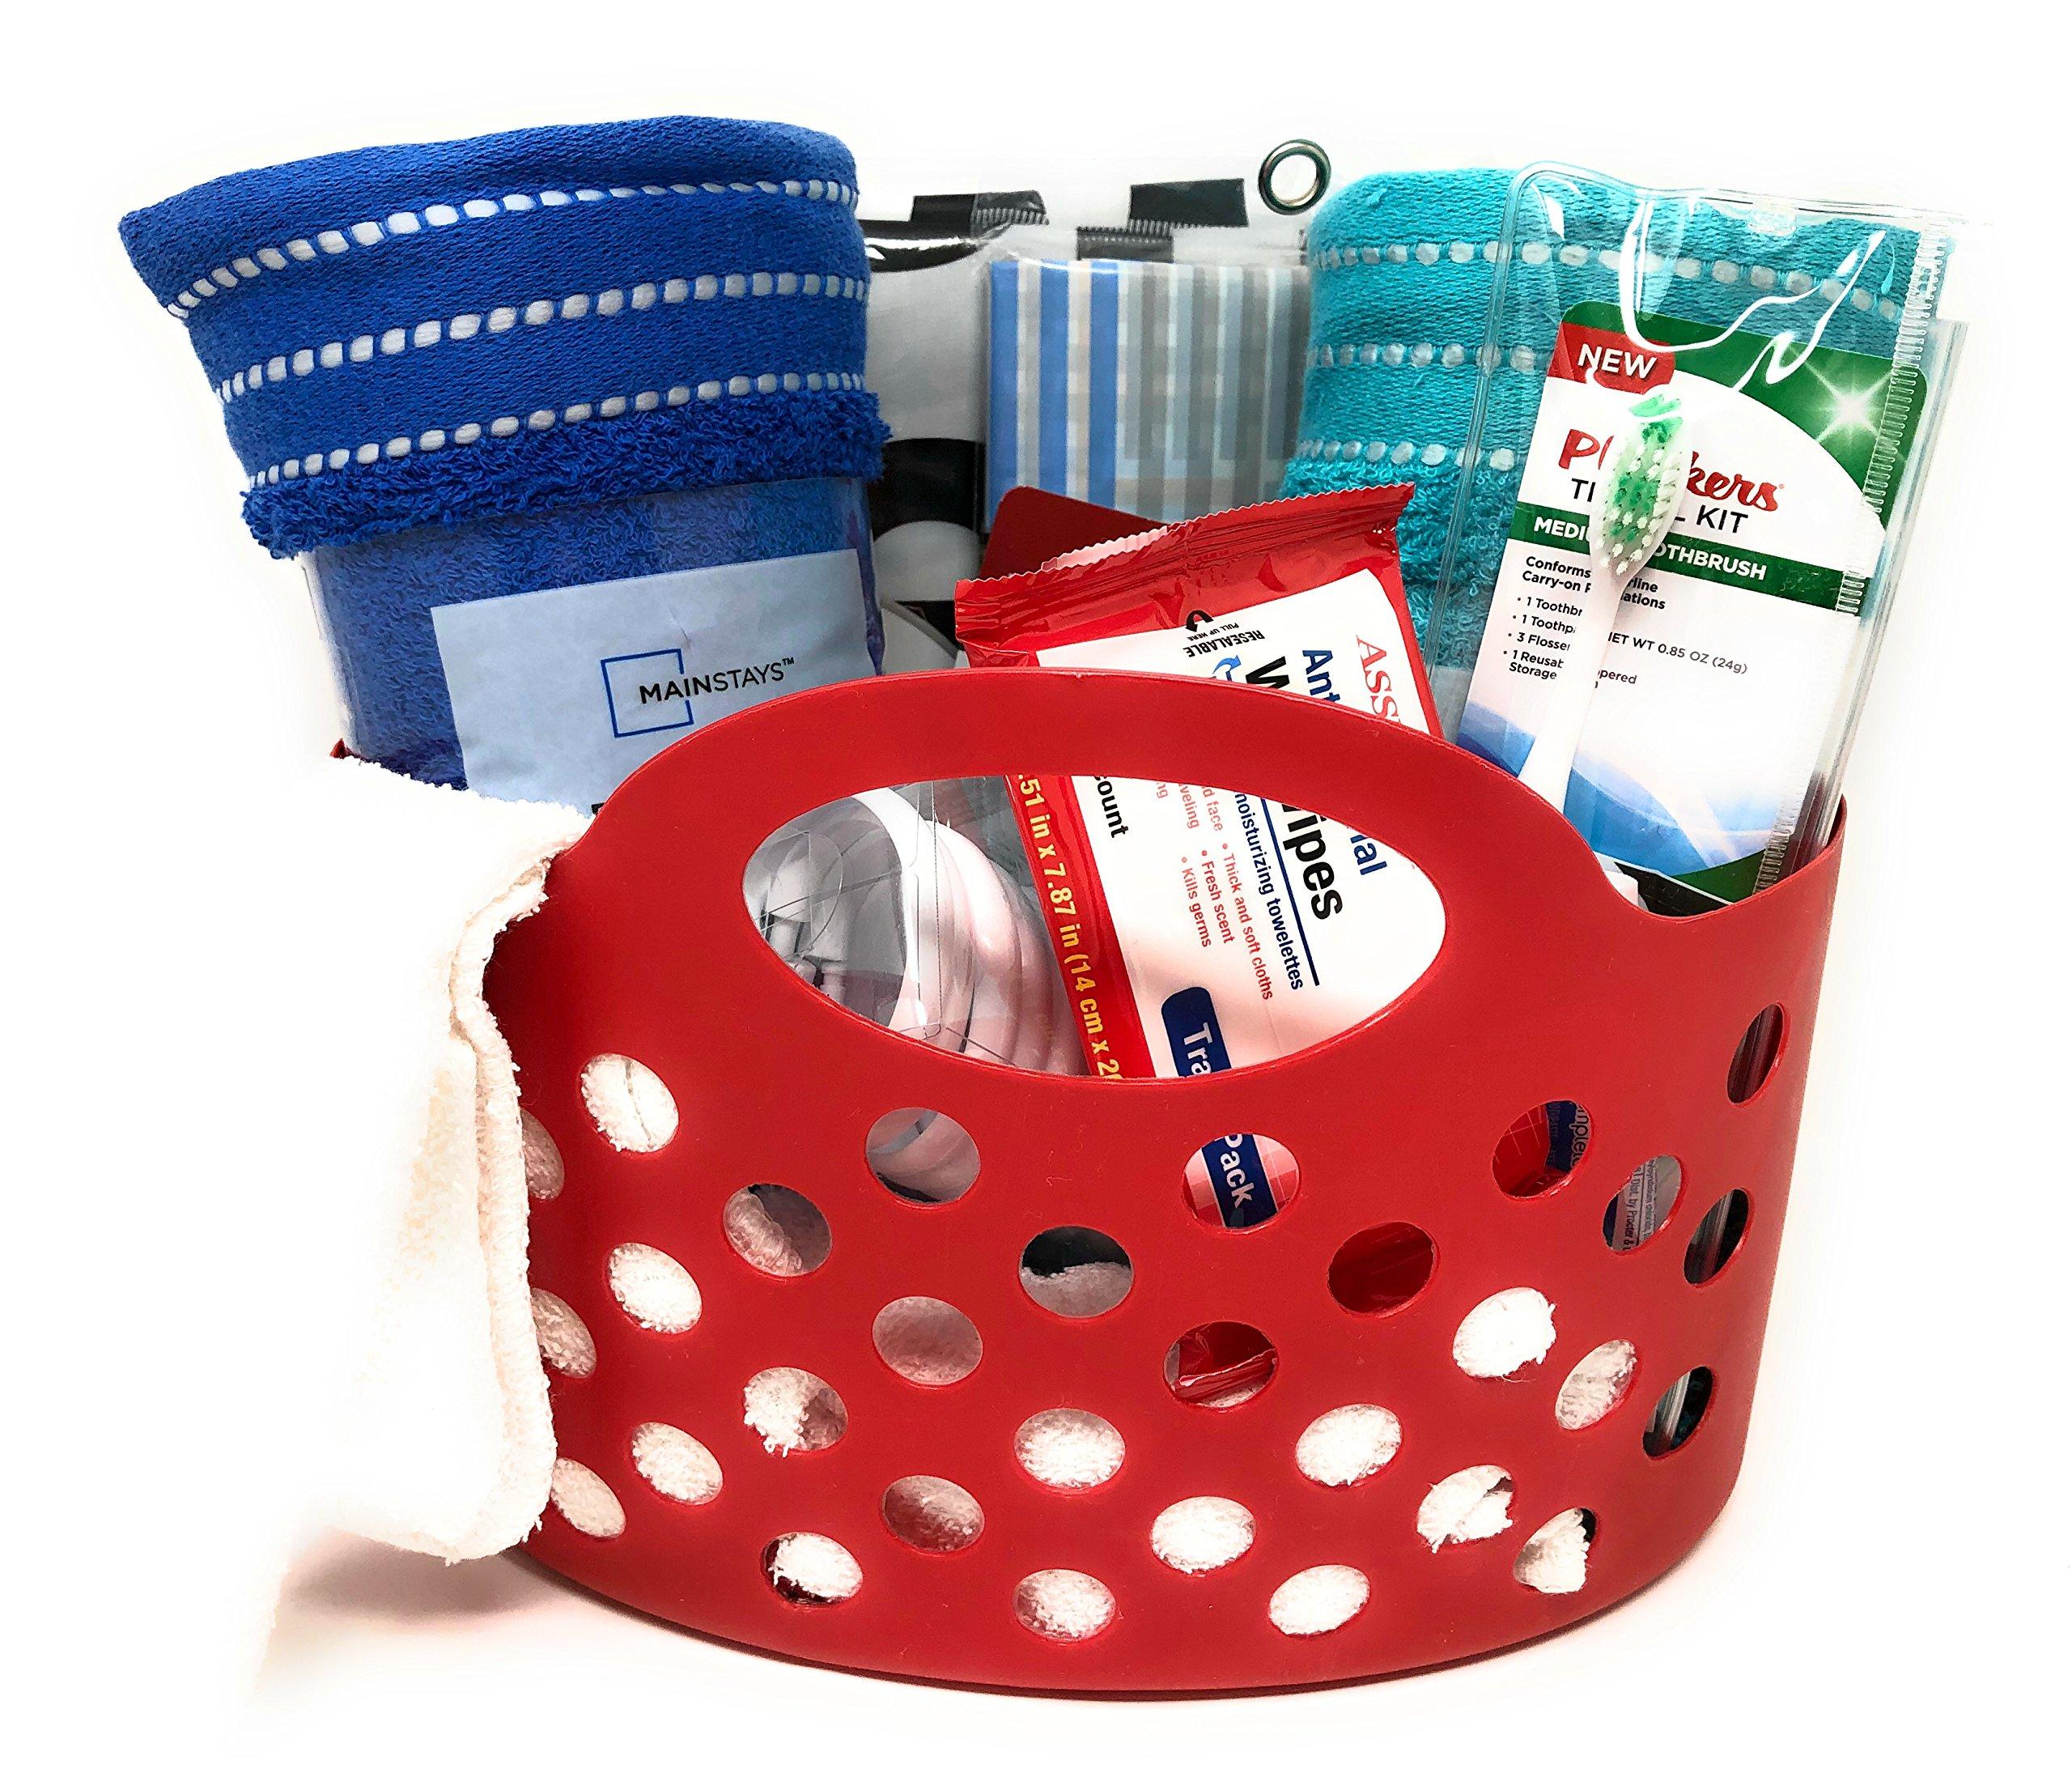 Ropeastar Travel Bathroom Essentials Kit, Laundry Bag With Plastic Waterproof Tote Bag Caddy for College Dorm Gym Camp, Bath & Shower Bundle, Graduate, Truckers (Printed Wash Me Bag)